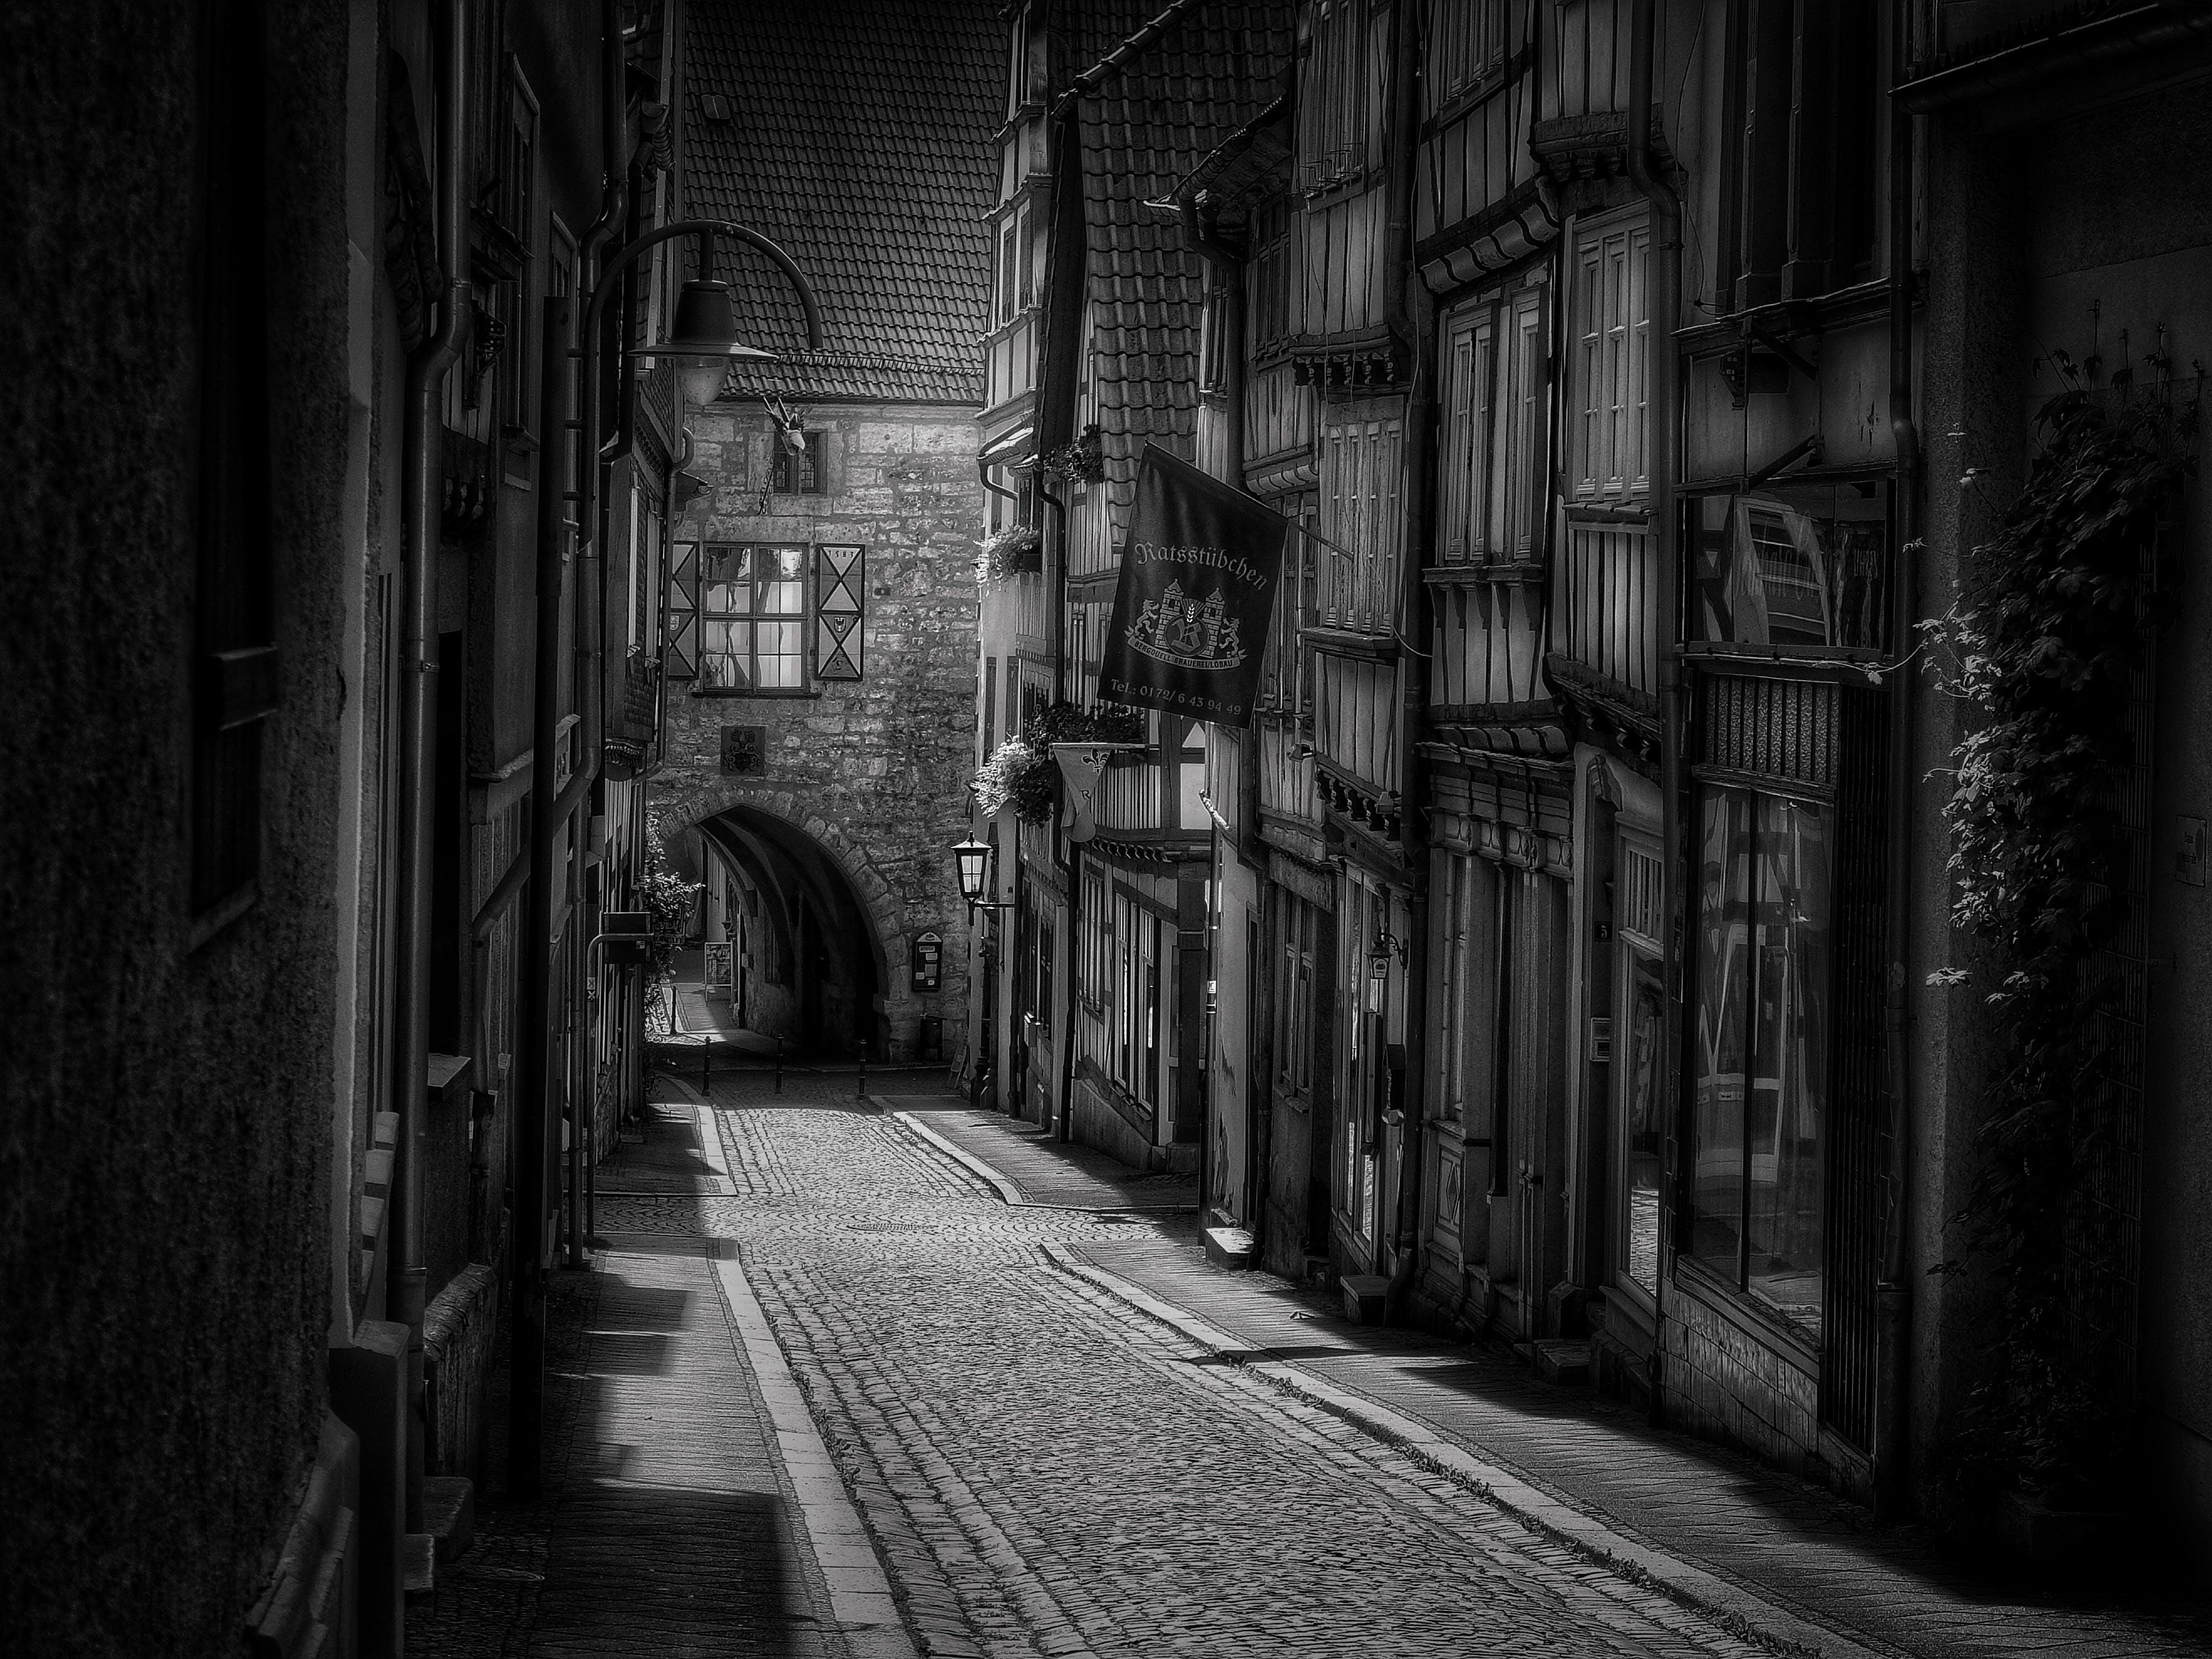 blanco y negro, braguero, calle de adoquines